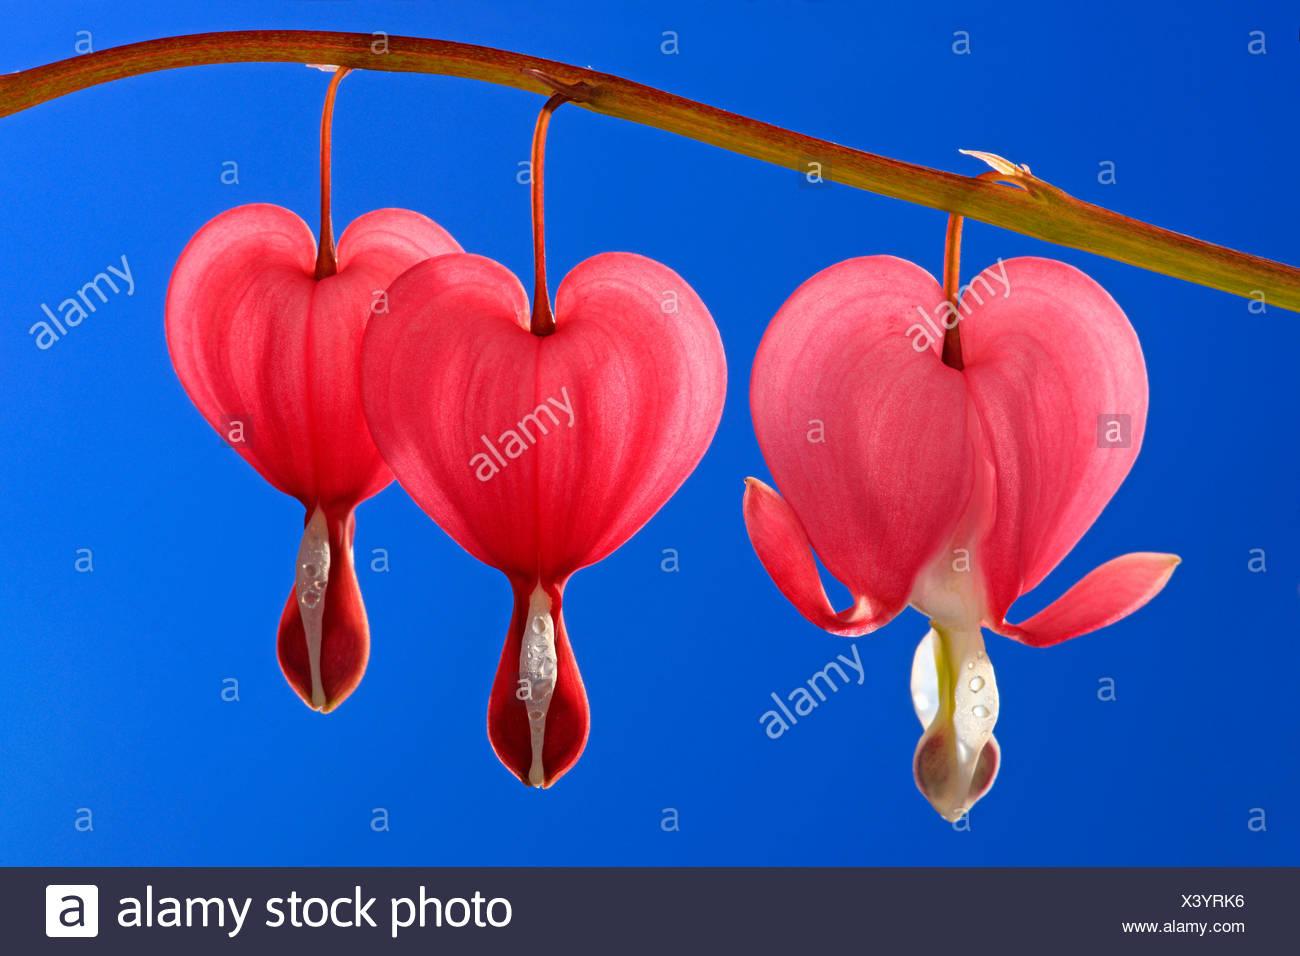 Bleeding Heart or Lyre-flower (Dicentra spectabilis), flowers - Stock Image